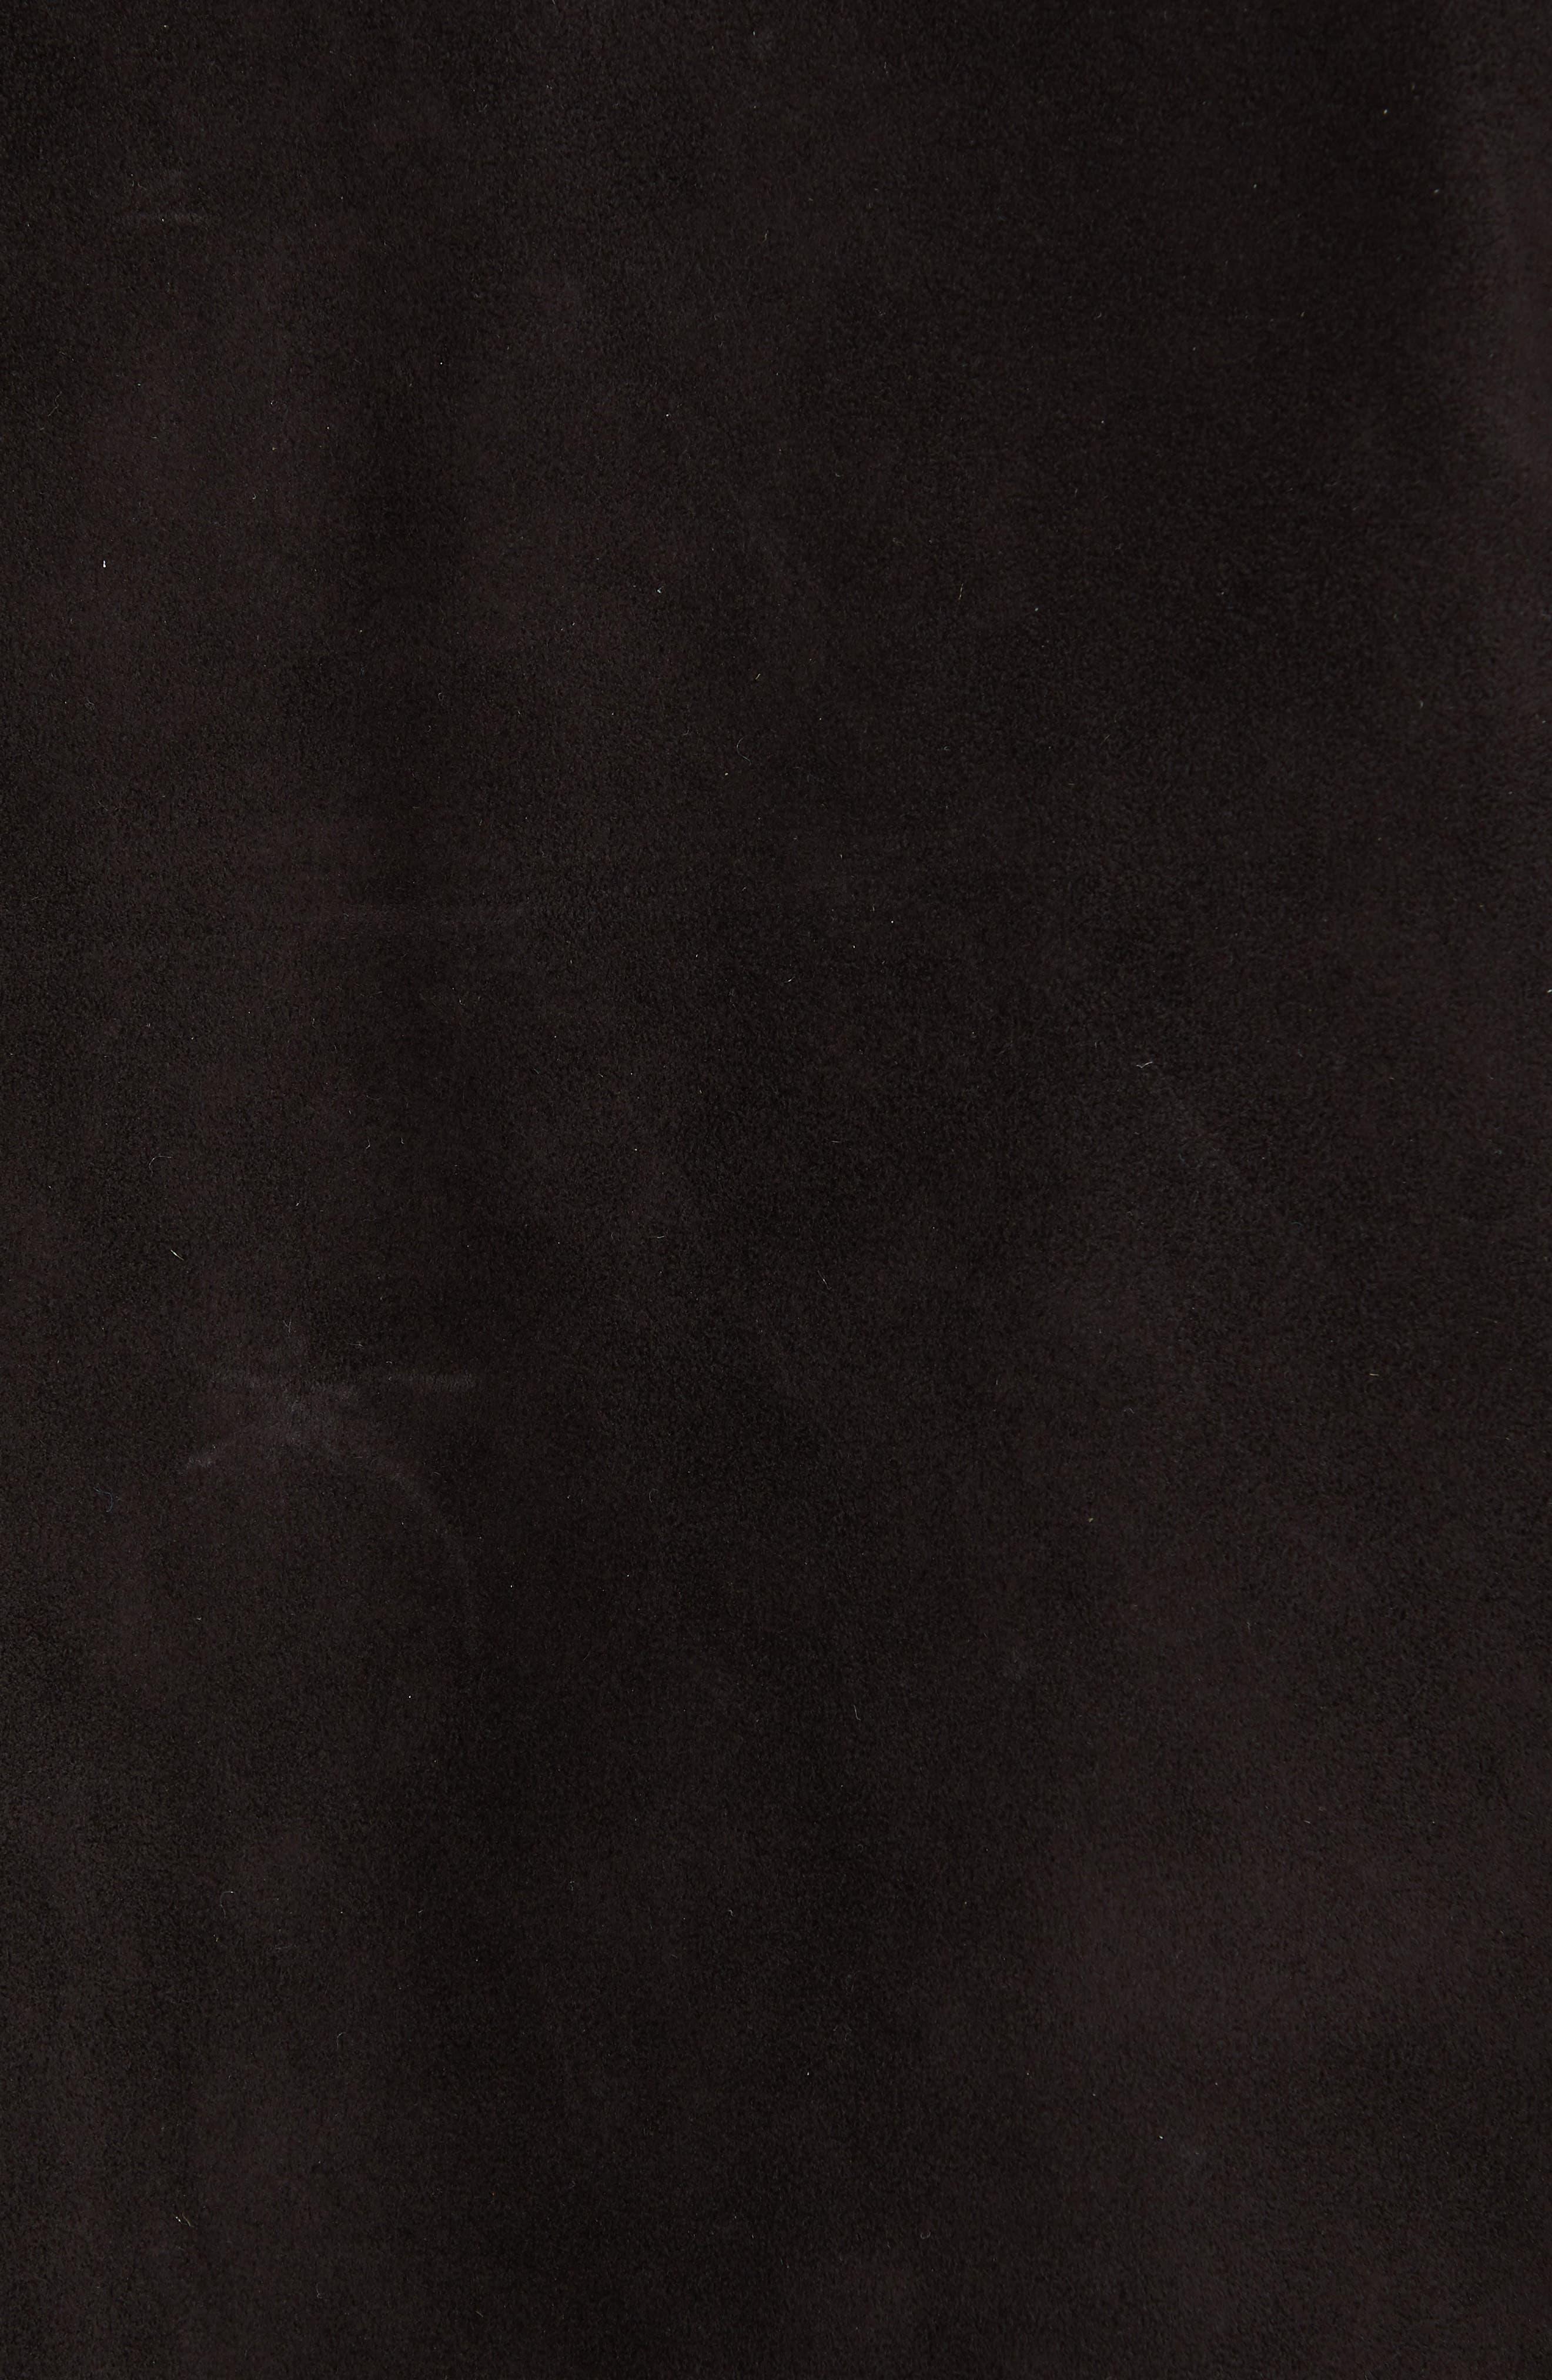 JOHN VARVATOS, Suede Flight Jacket, Alternate thumbnail 5, color, ESPRESSO